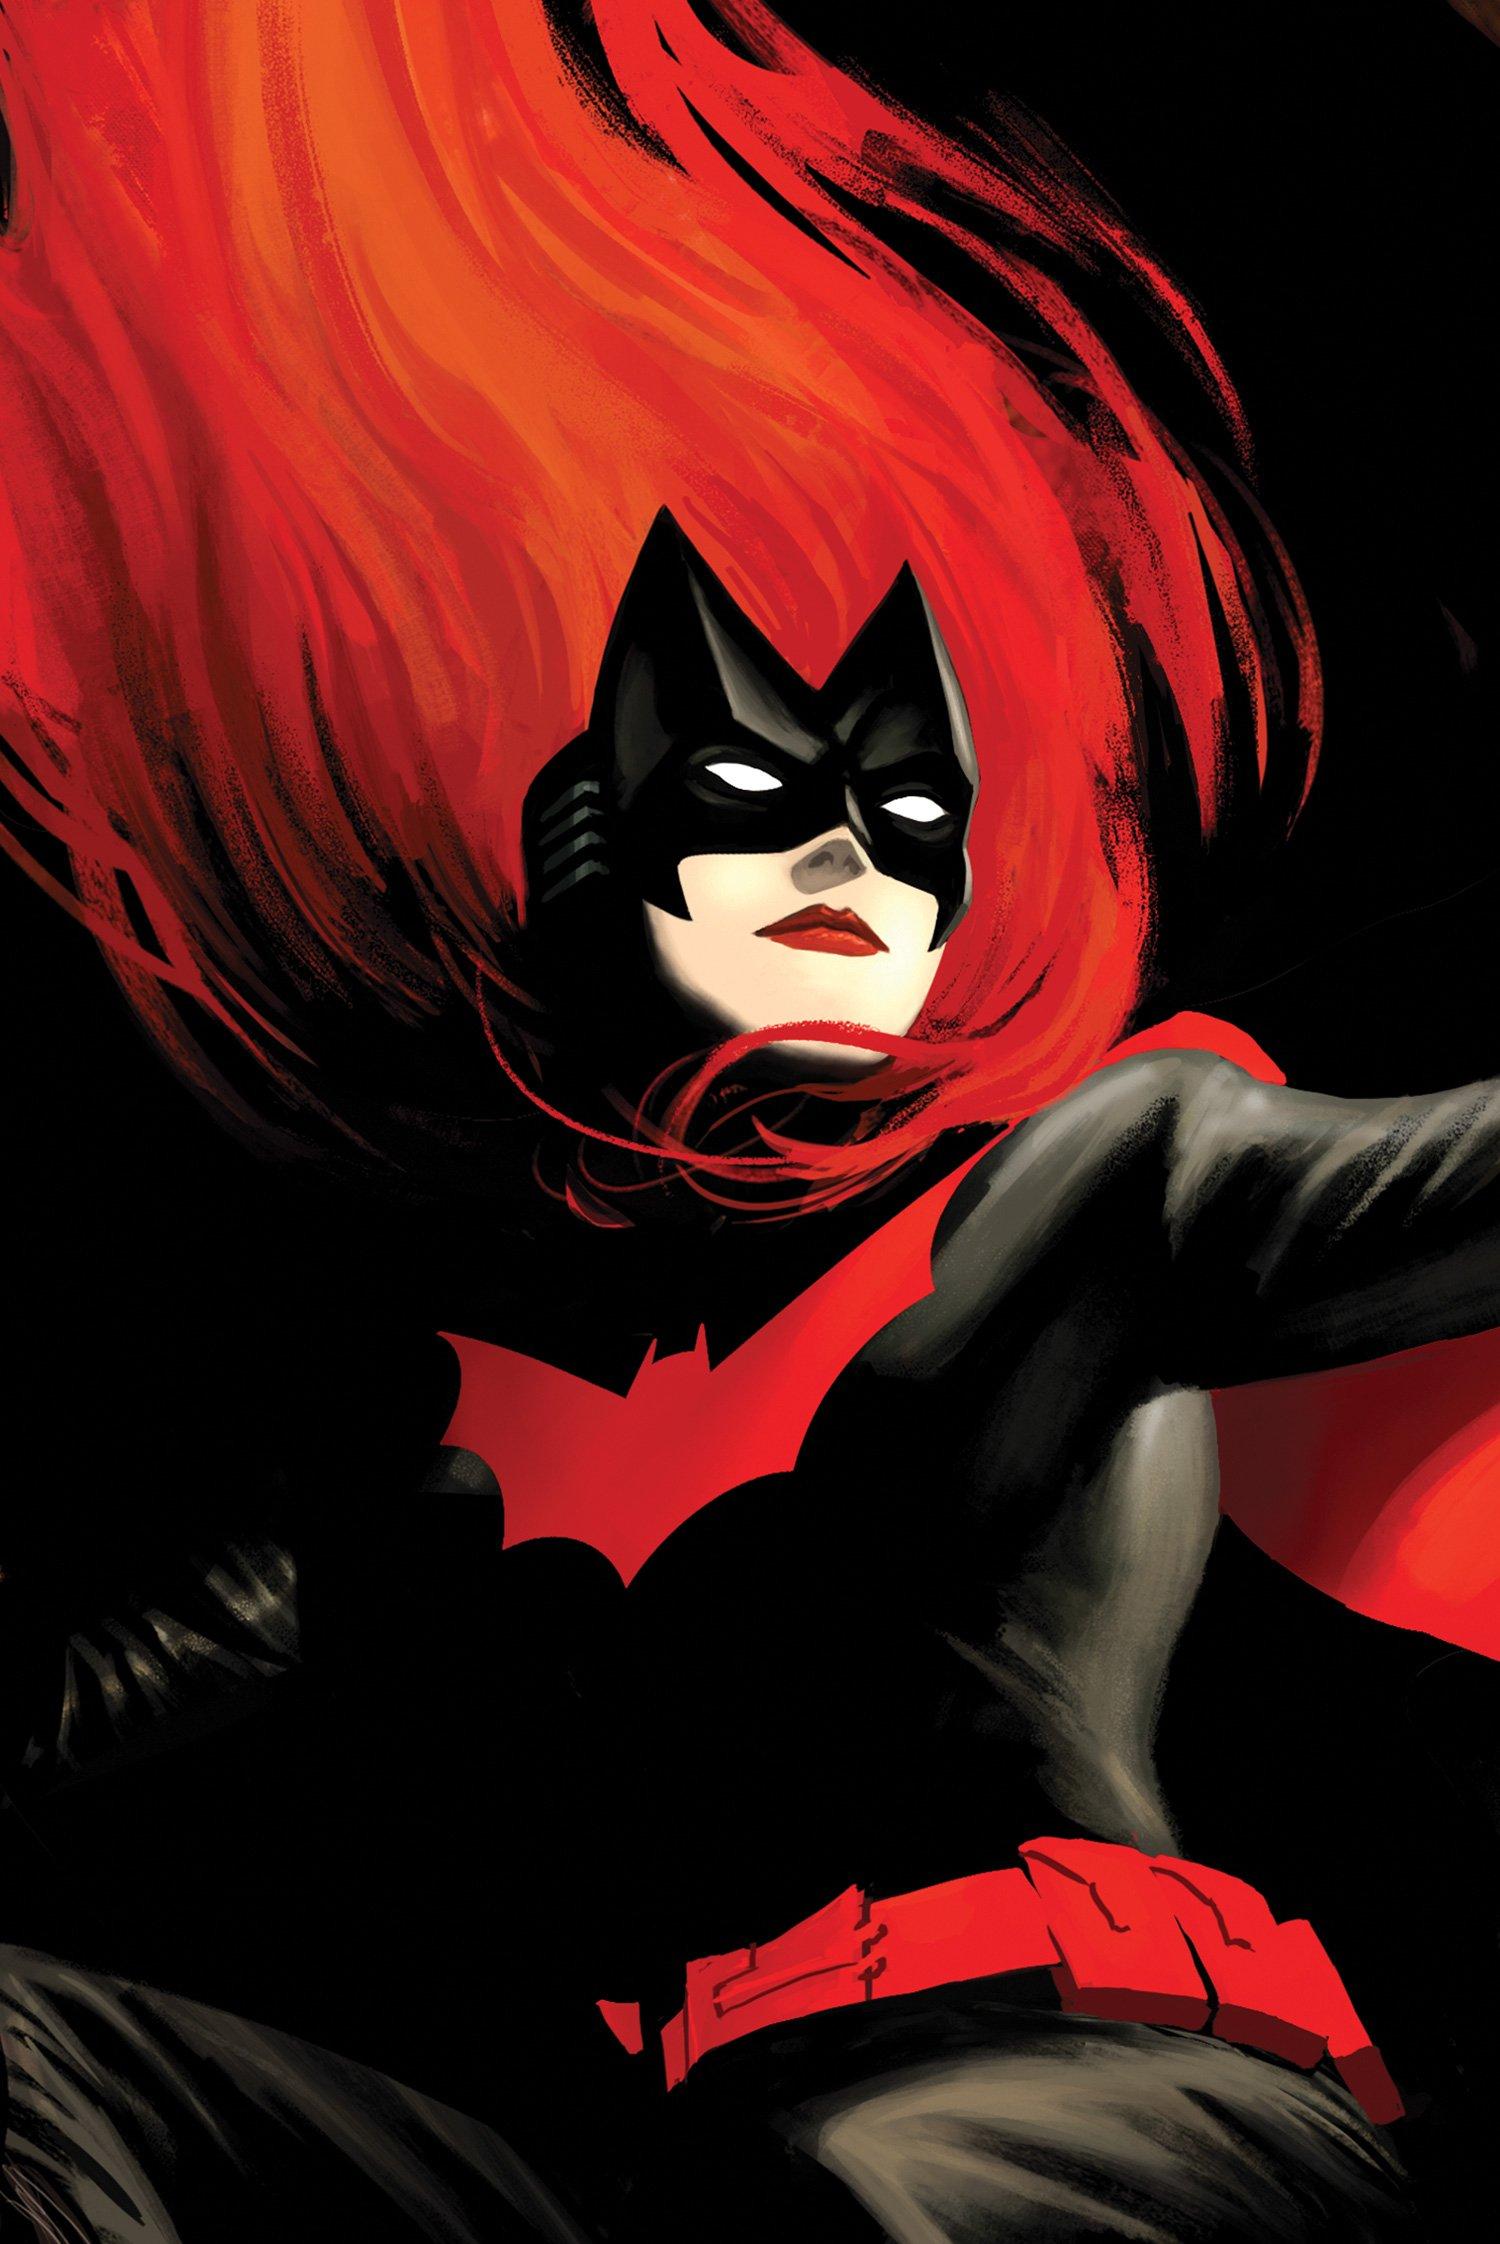 batwoman-profile-7b3964-BW_Cv1-1500x2244-v1.jpg